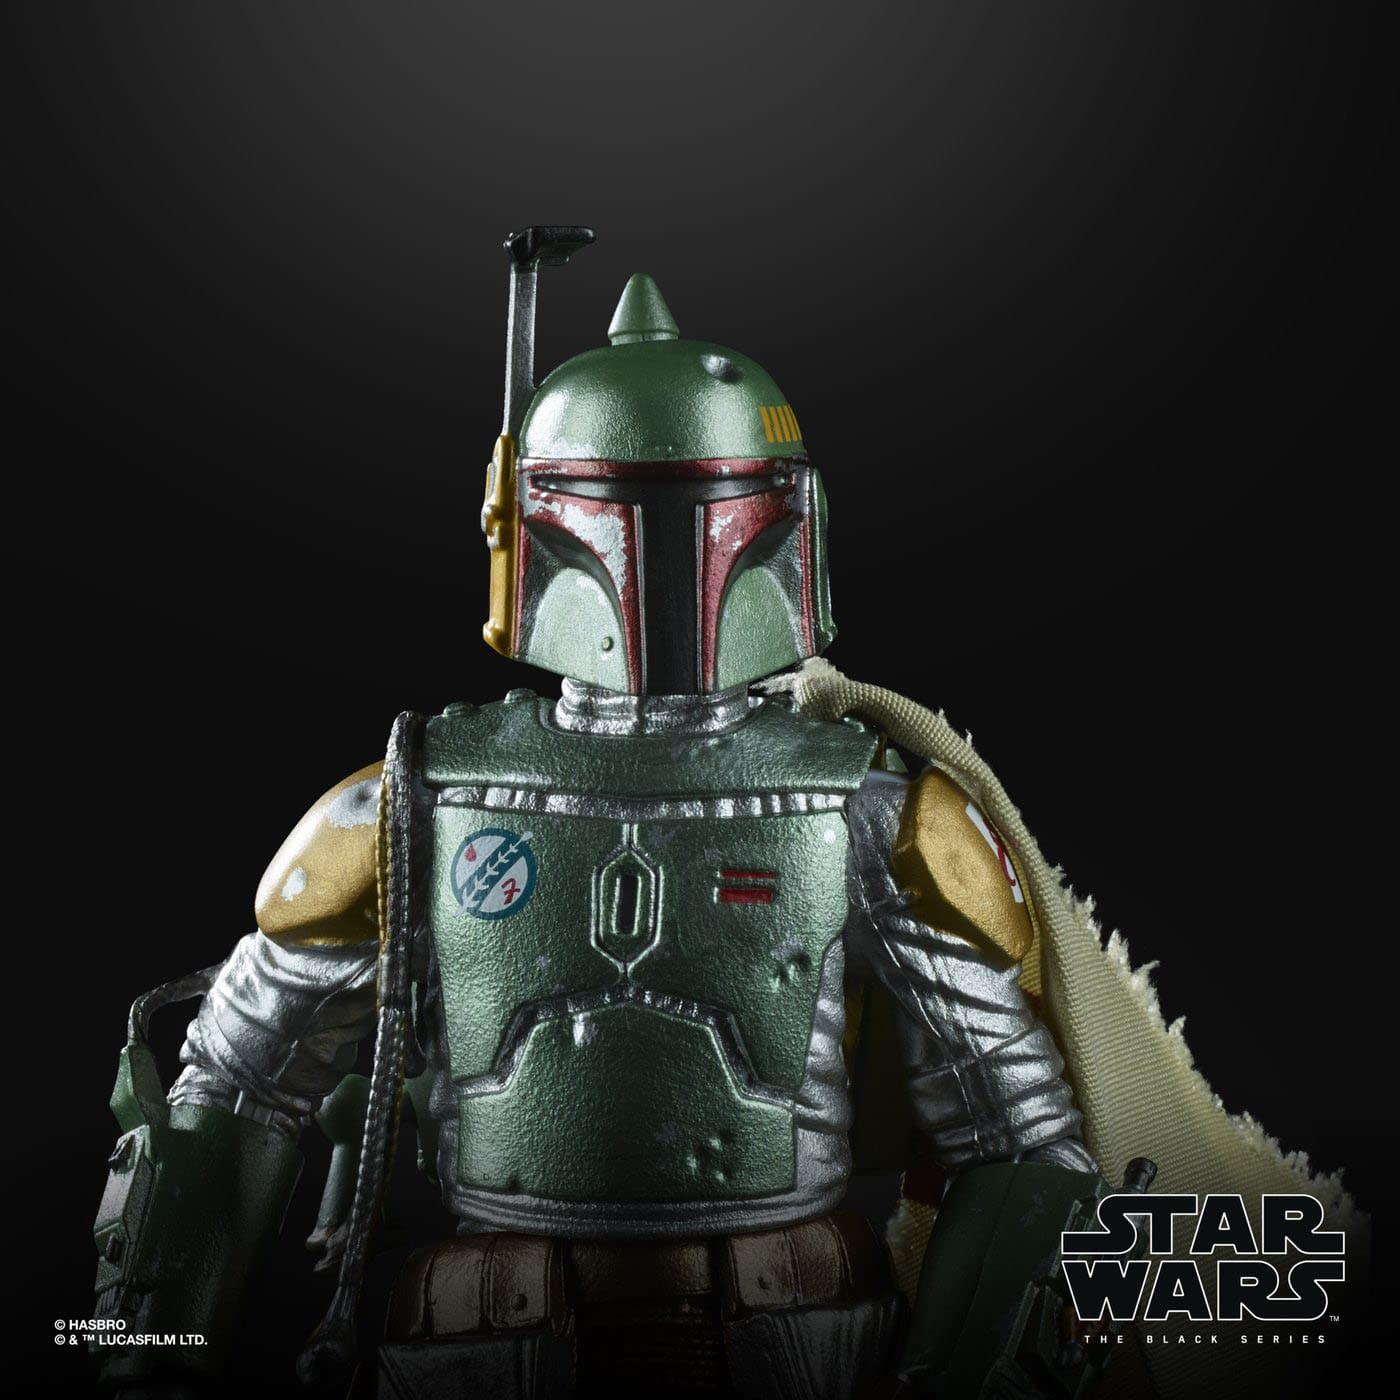 Star-Wars-Black-Series-Carbonized-Boba-Fett-005